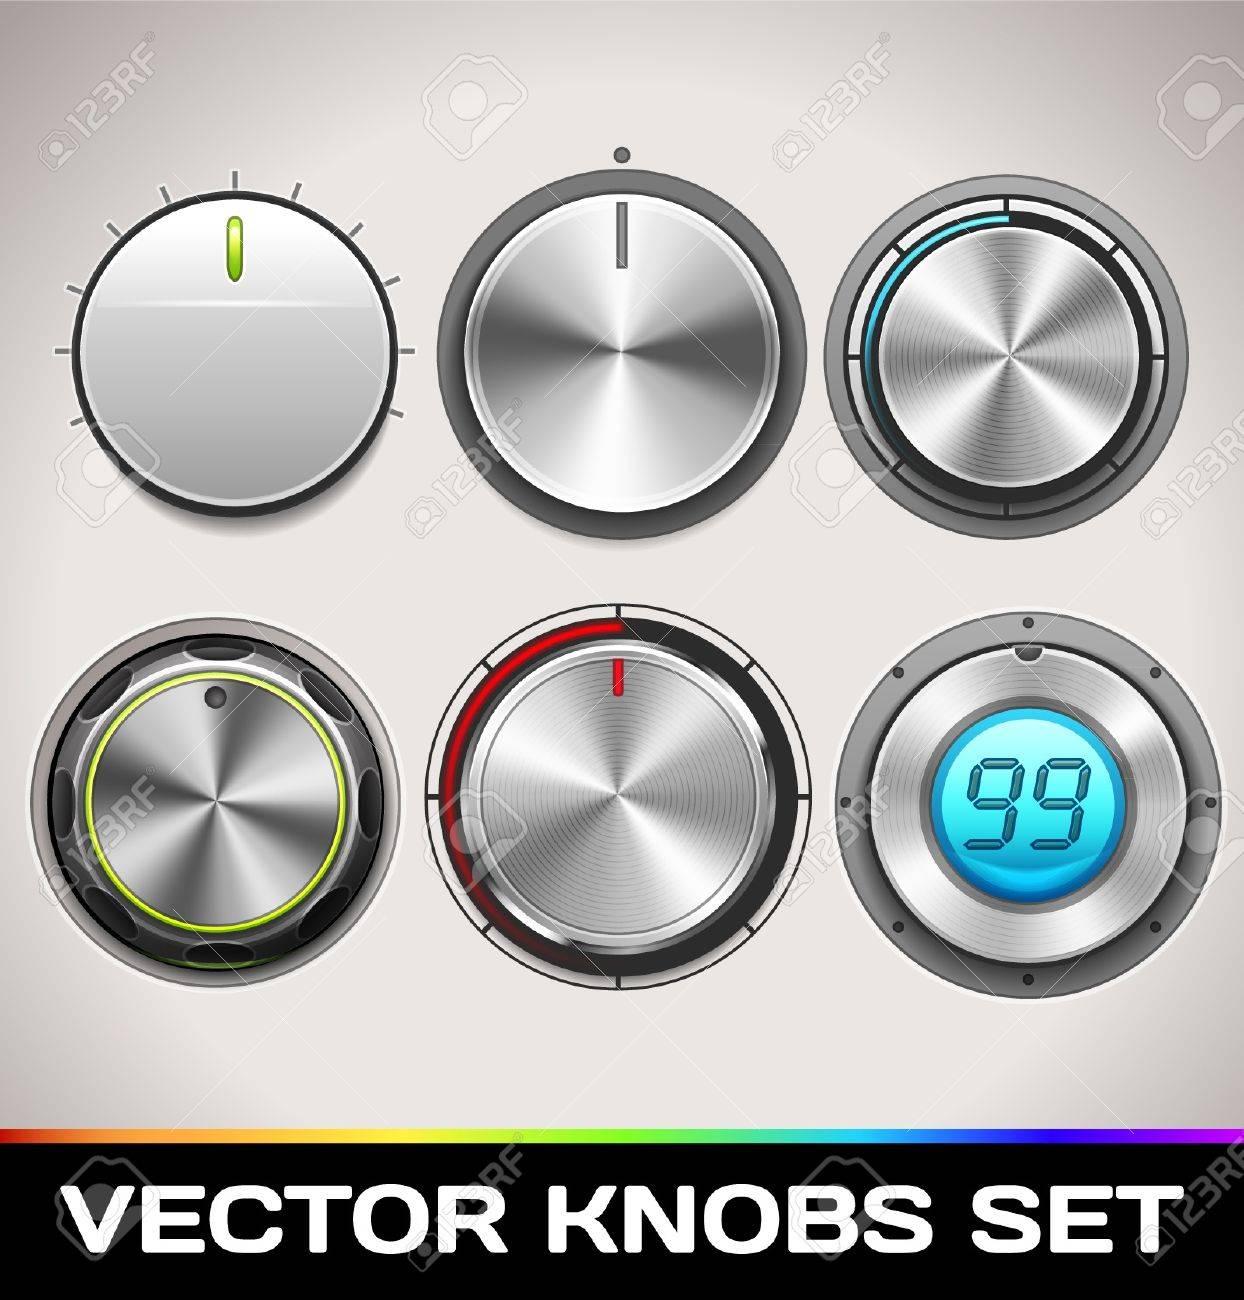 Knobs Set Stock Vector - 16873024